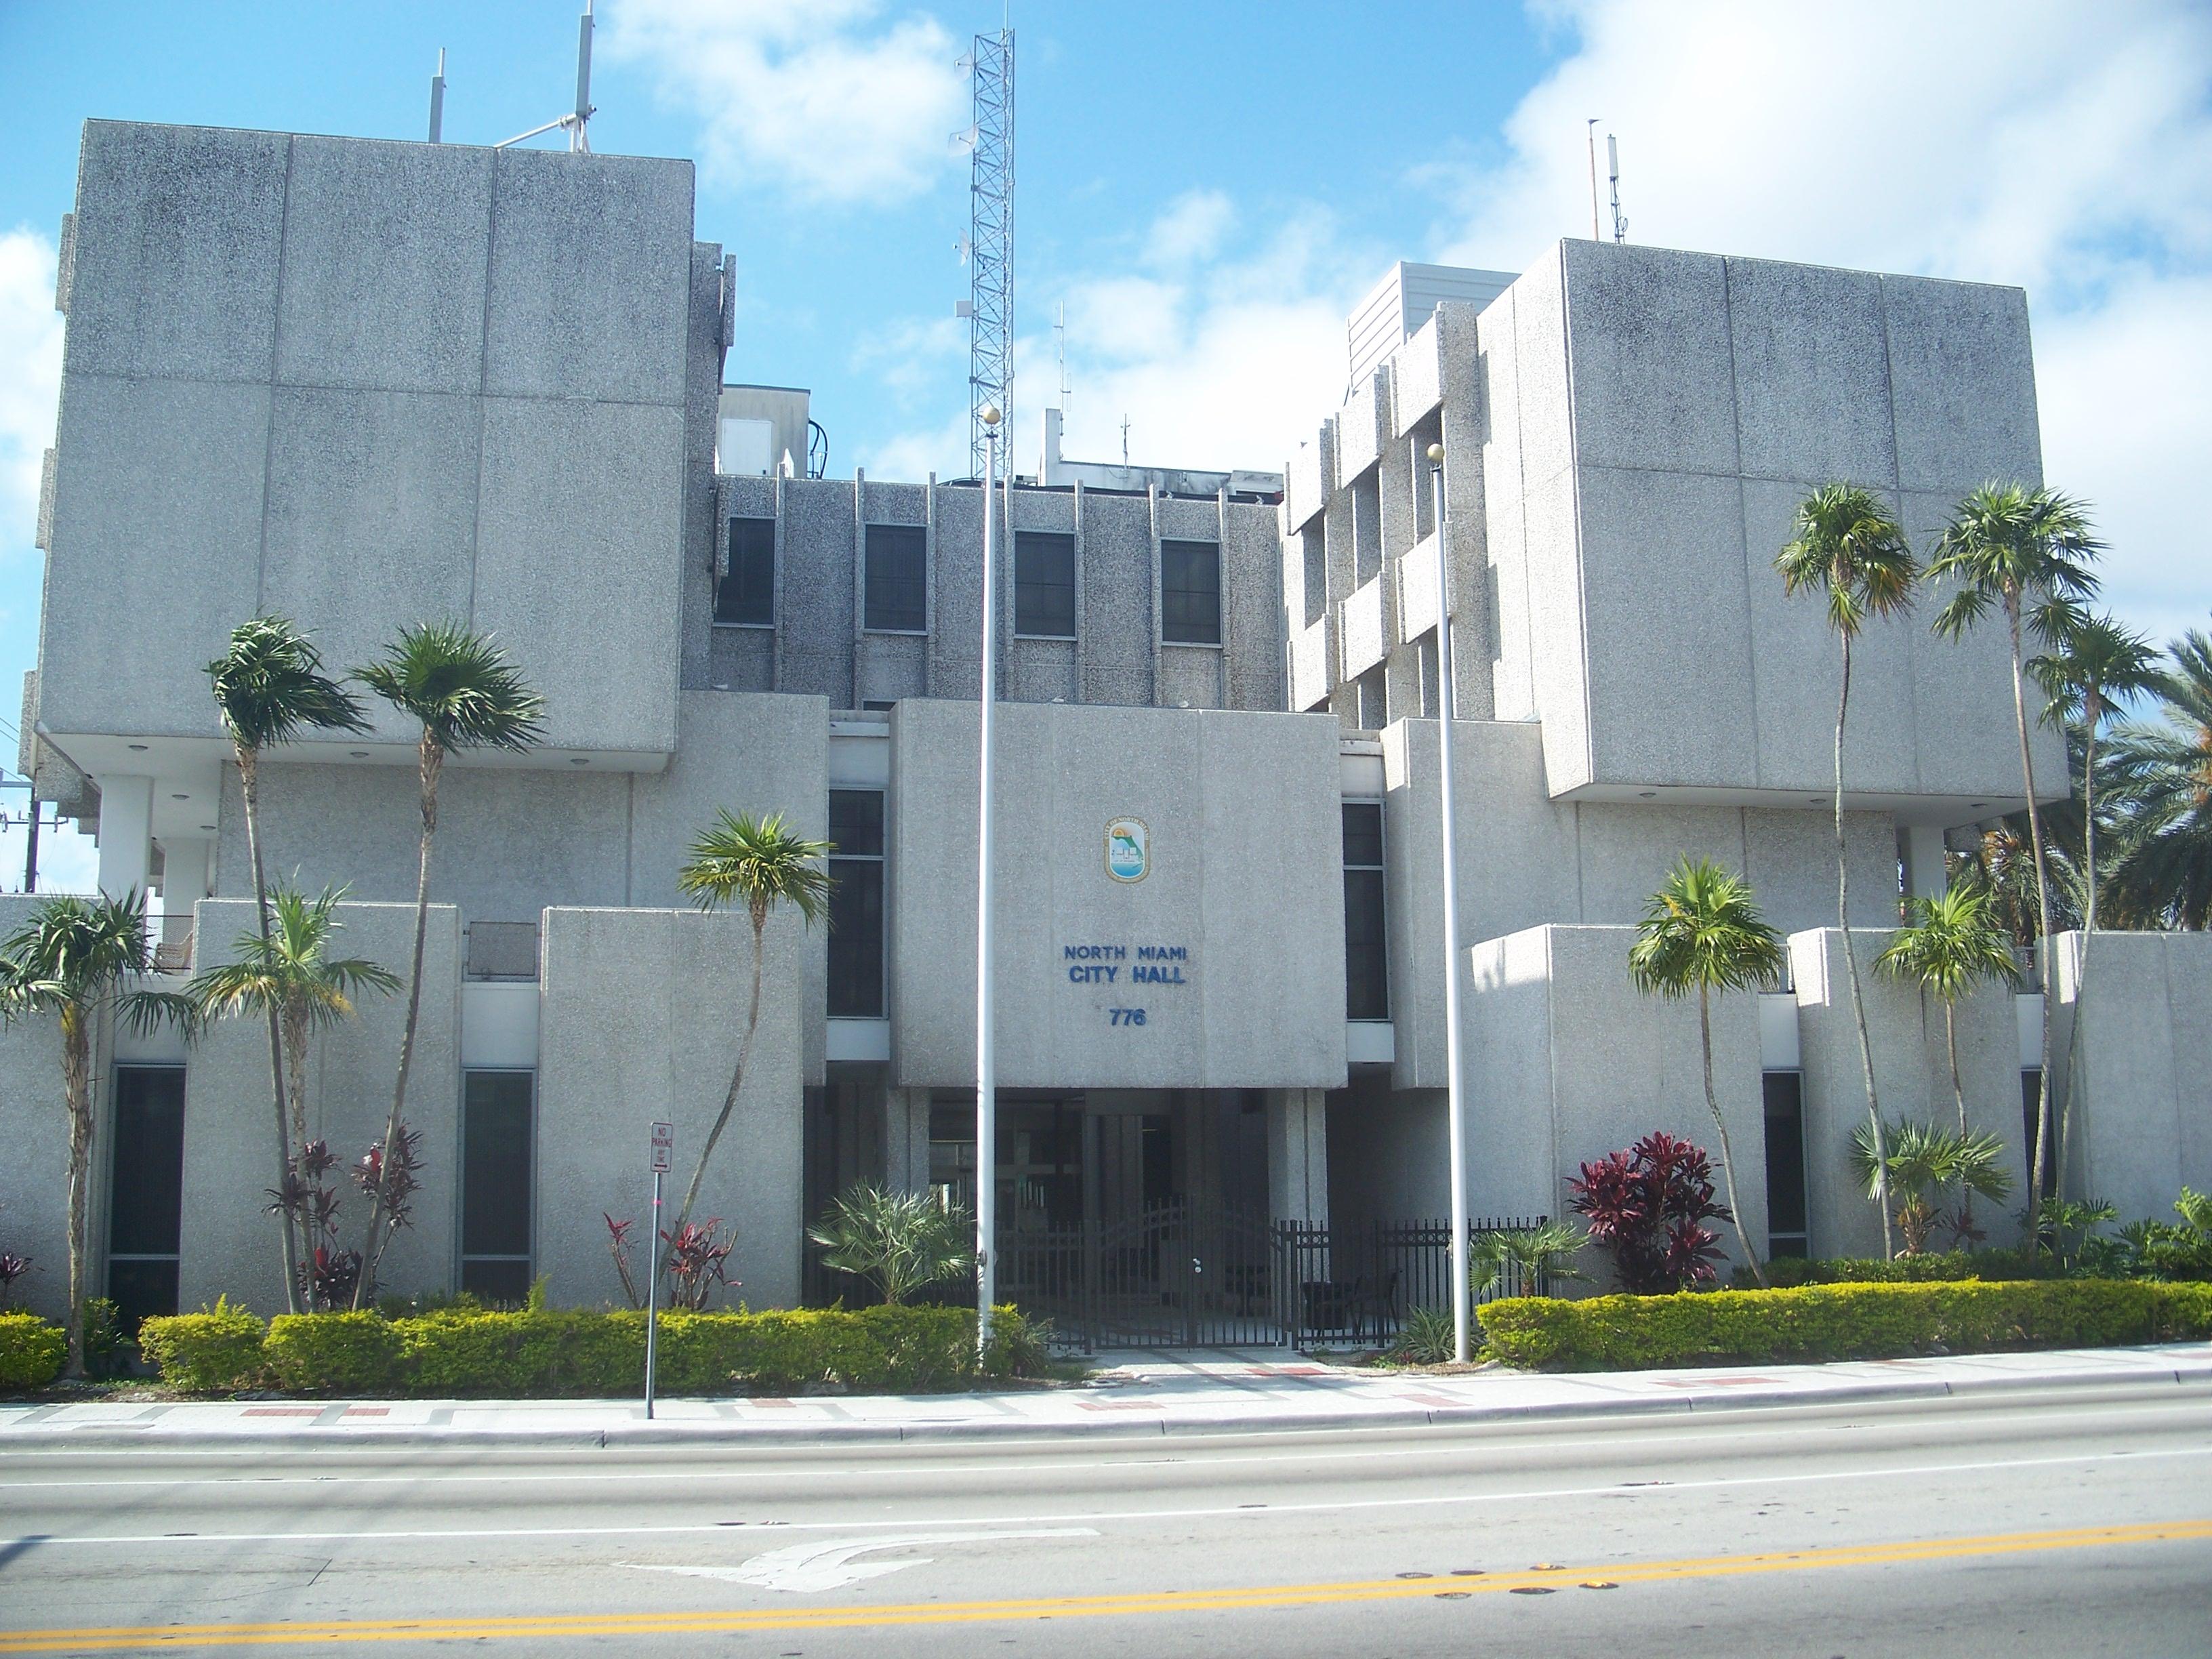 City Of North Miam Beach Building Department